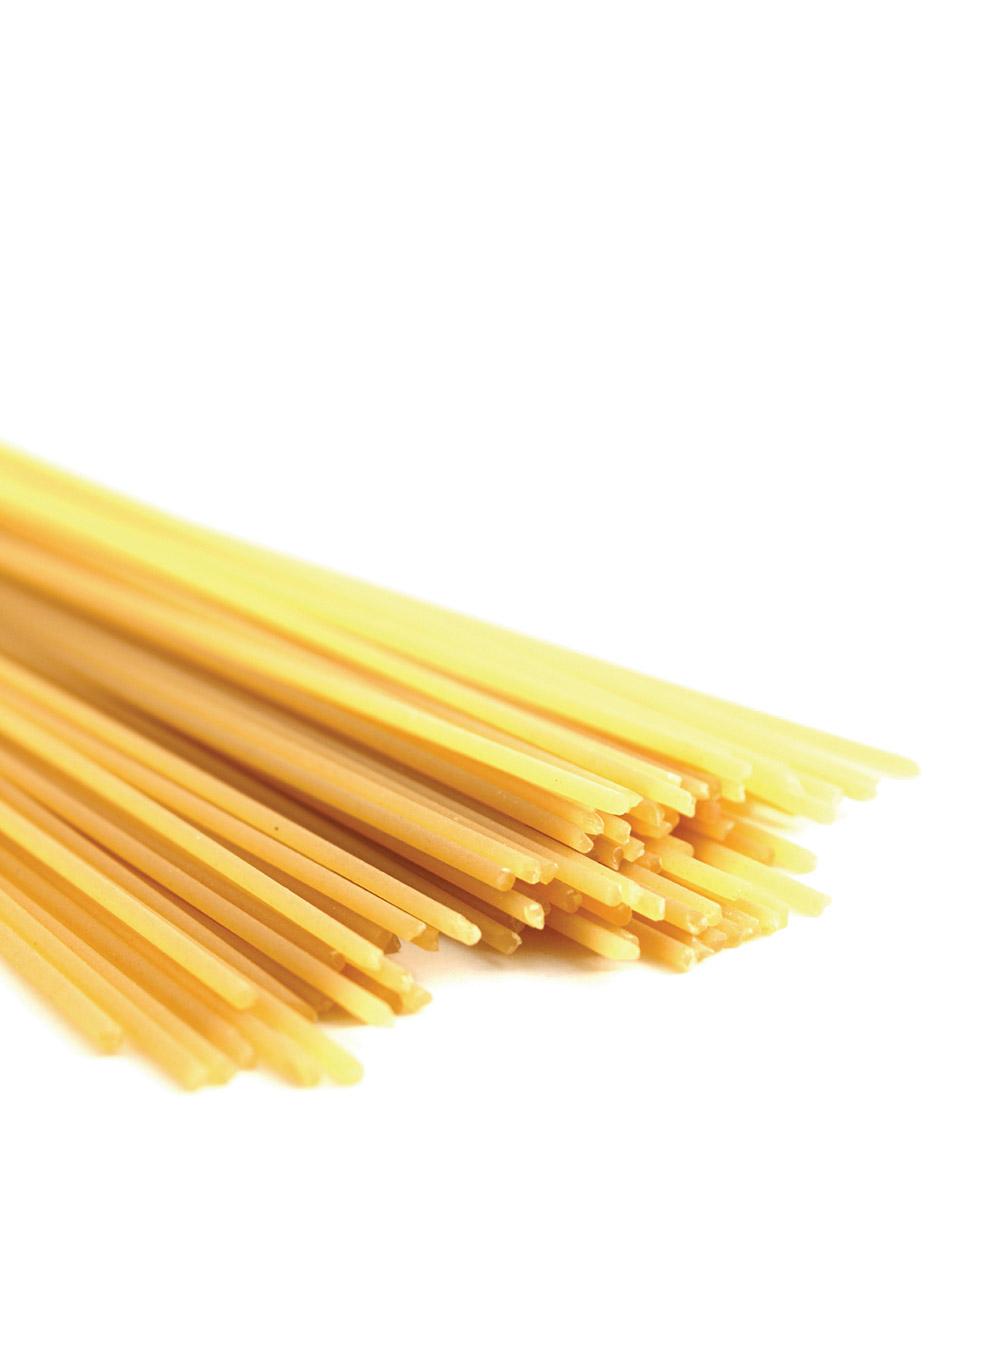 Spaghettis au pesto de roquette | ricardo